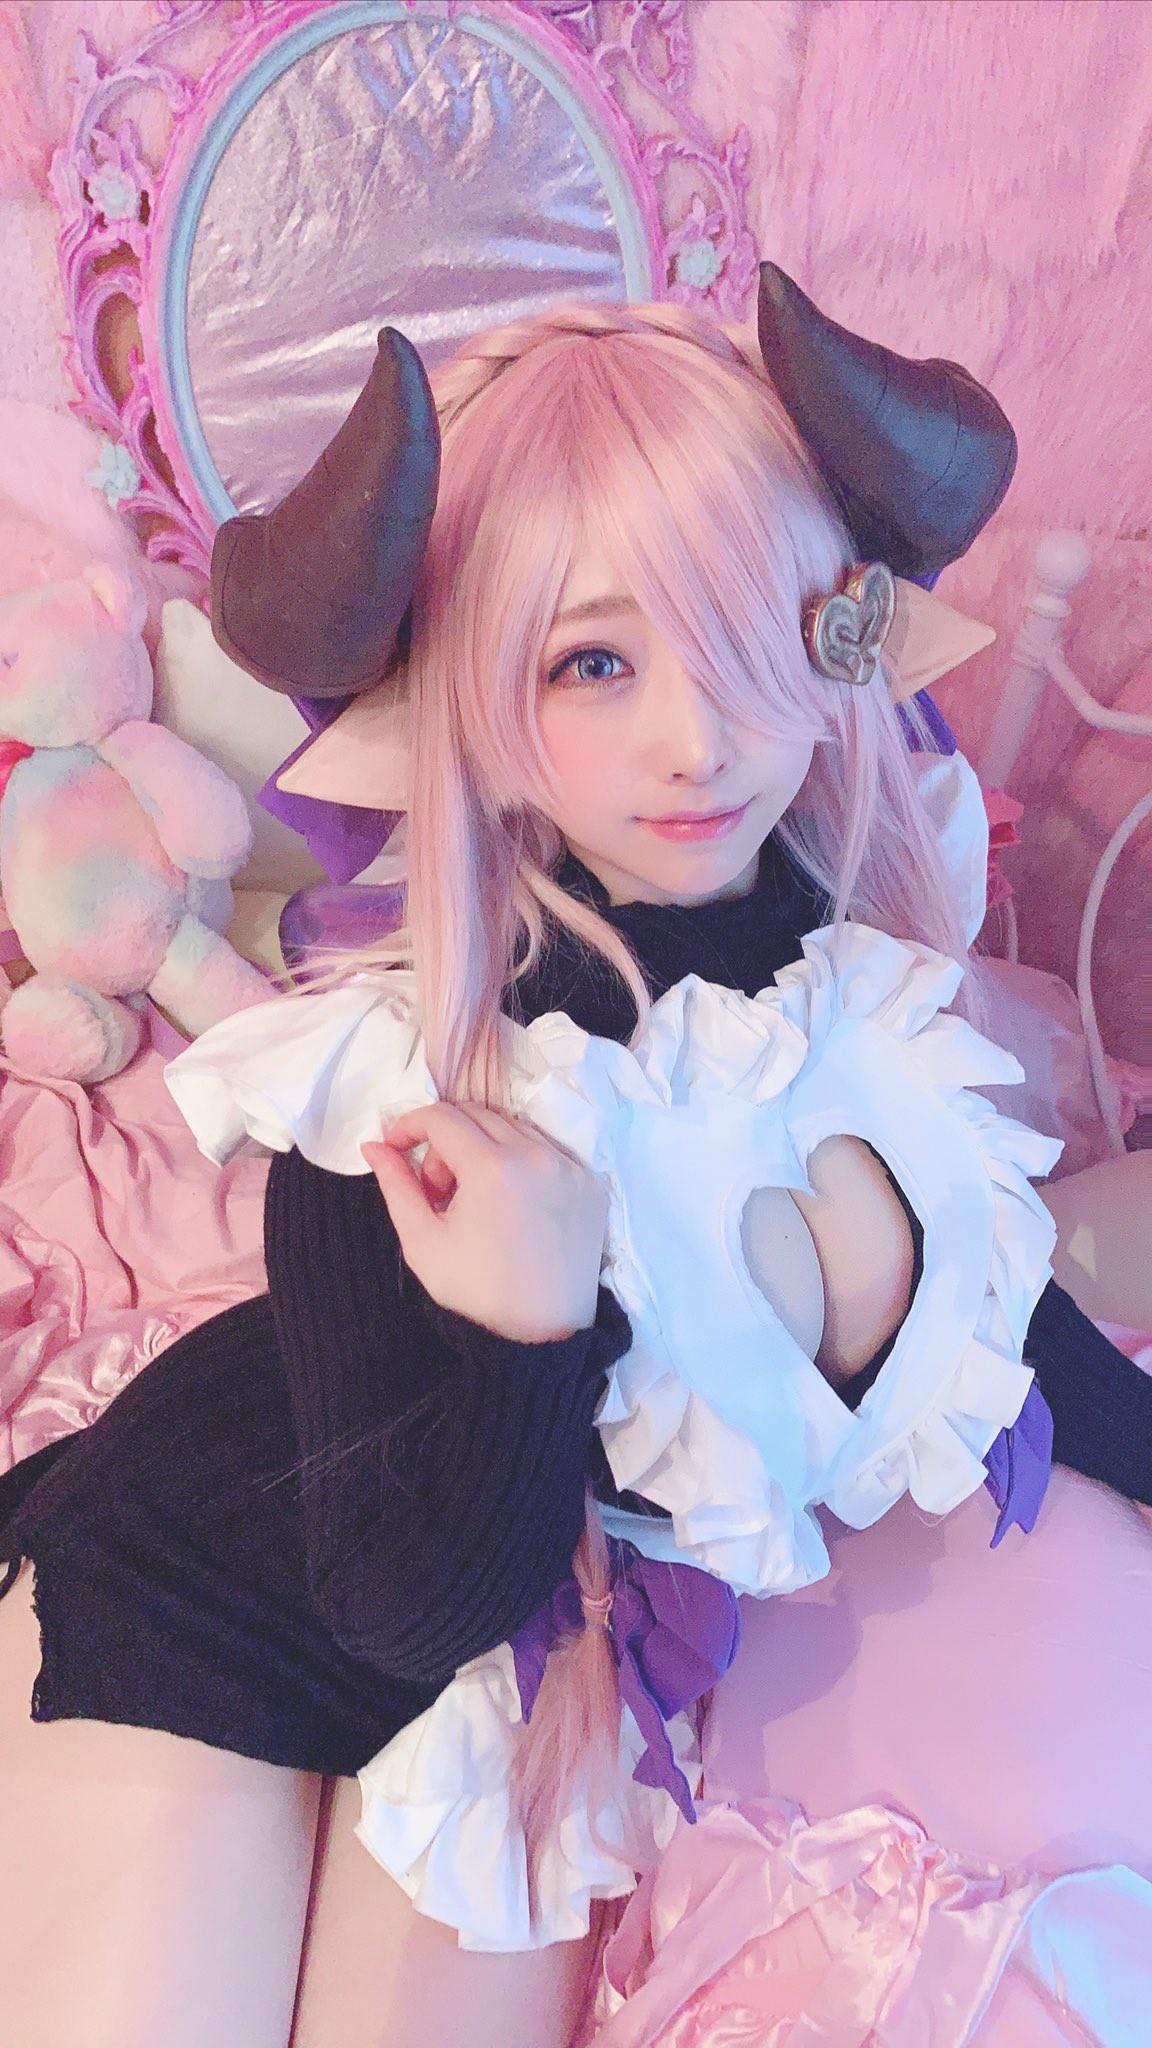 COS分享Granblue Fantasy Nalmere @mmm_mii_ みぃこ【宅次元】 - COSPLAY -